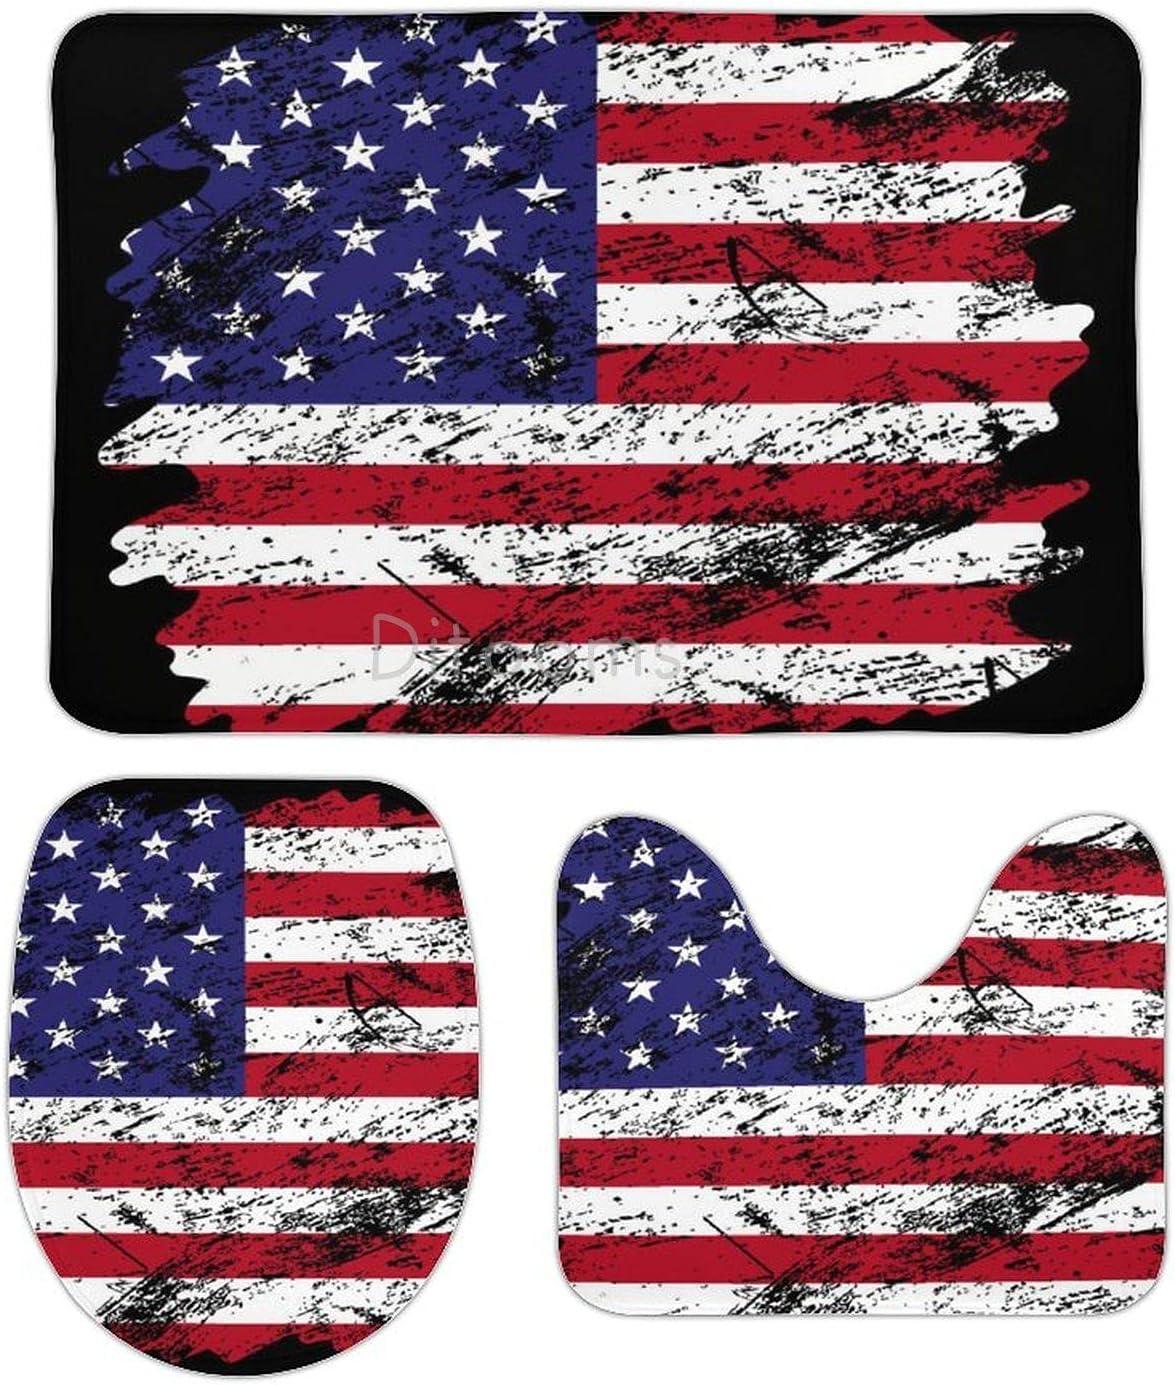 3 Pieces Set USA Flag Brush Background Max 90% OFF Old Bathroom San Diego Mall R